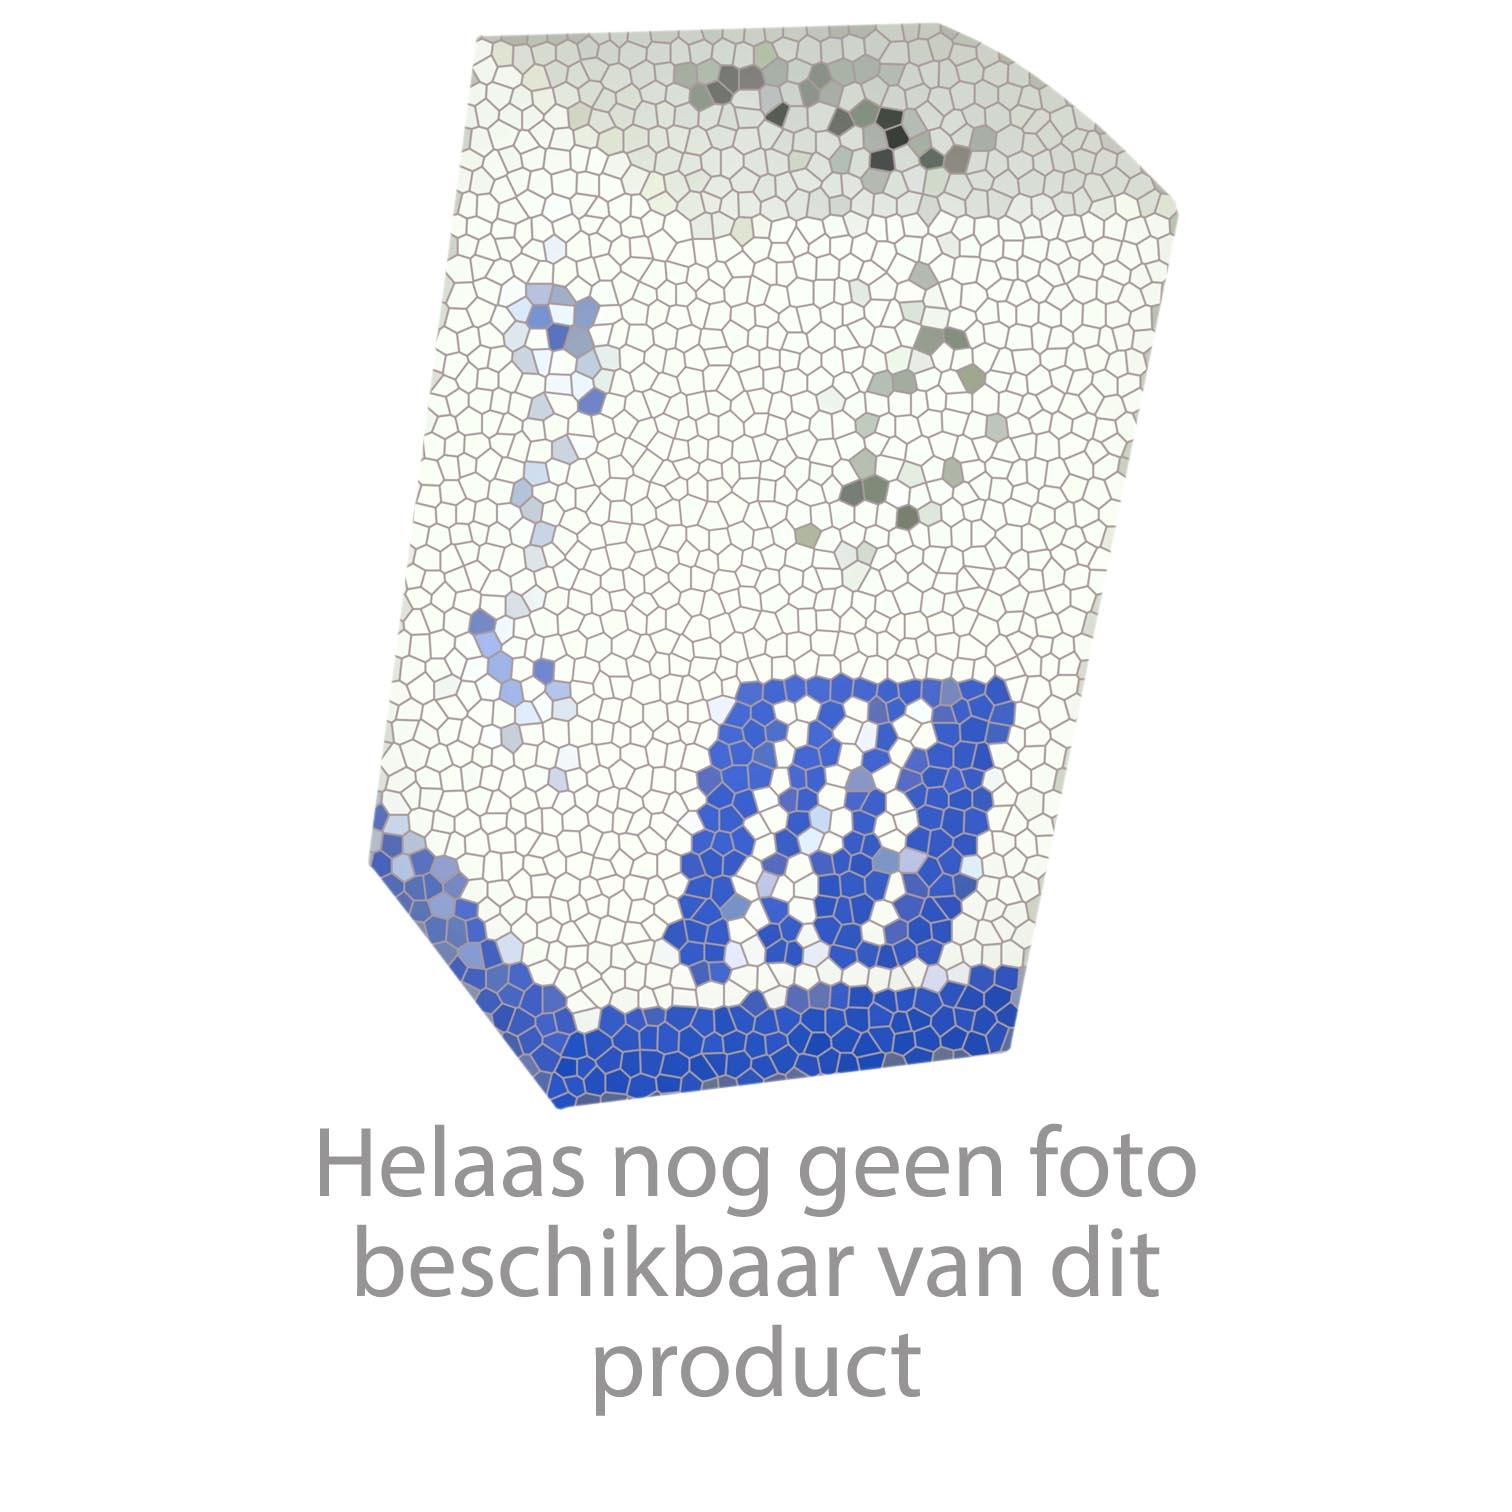 Grohe Onderdelen Allure Wastafelkraan Wastafelmengkraan XL-Size Artikelnummer 23403000